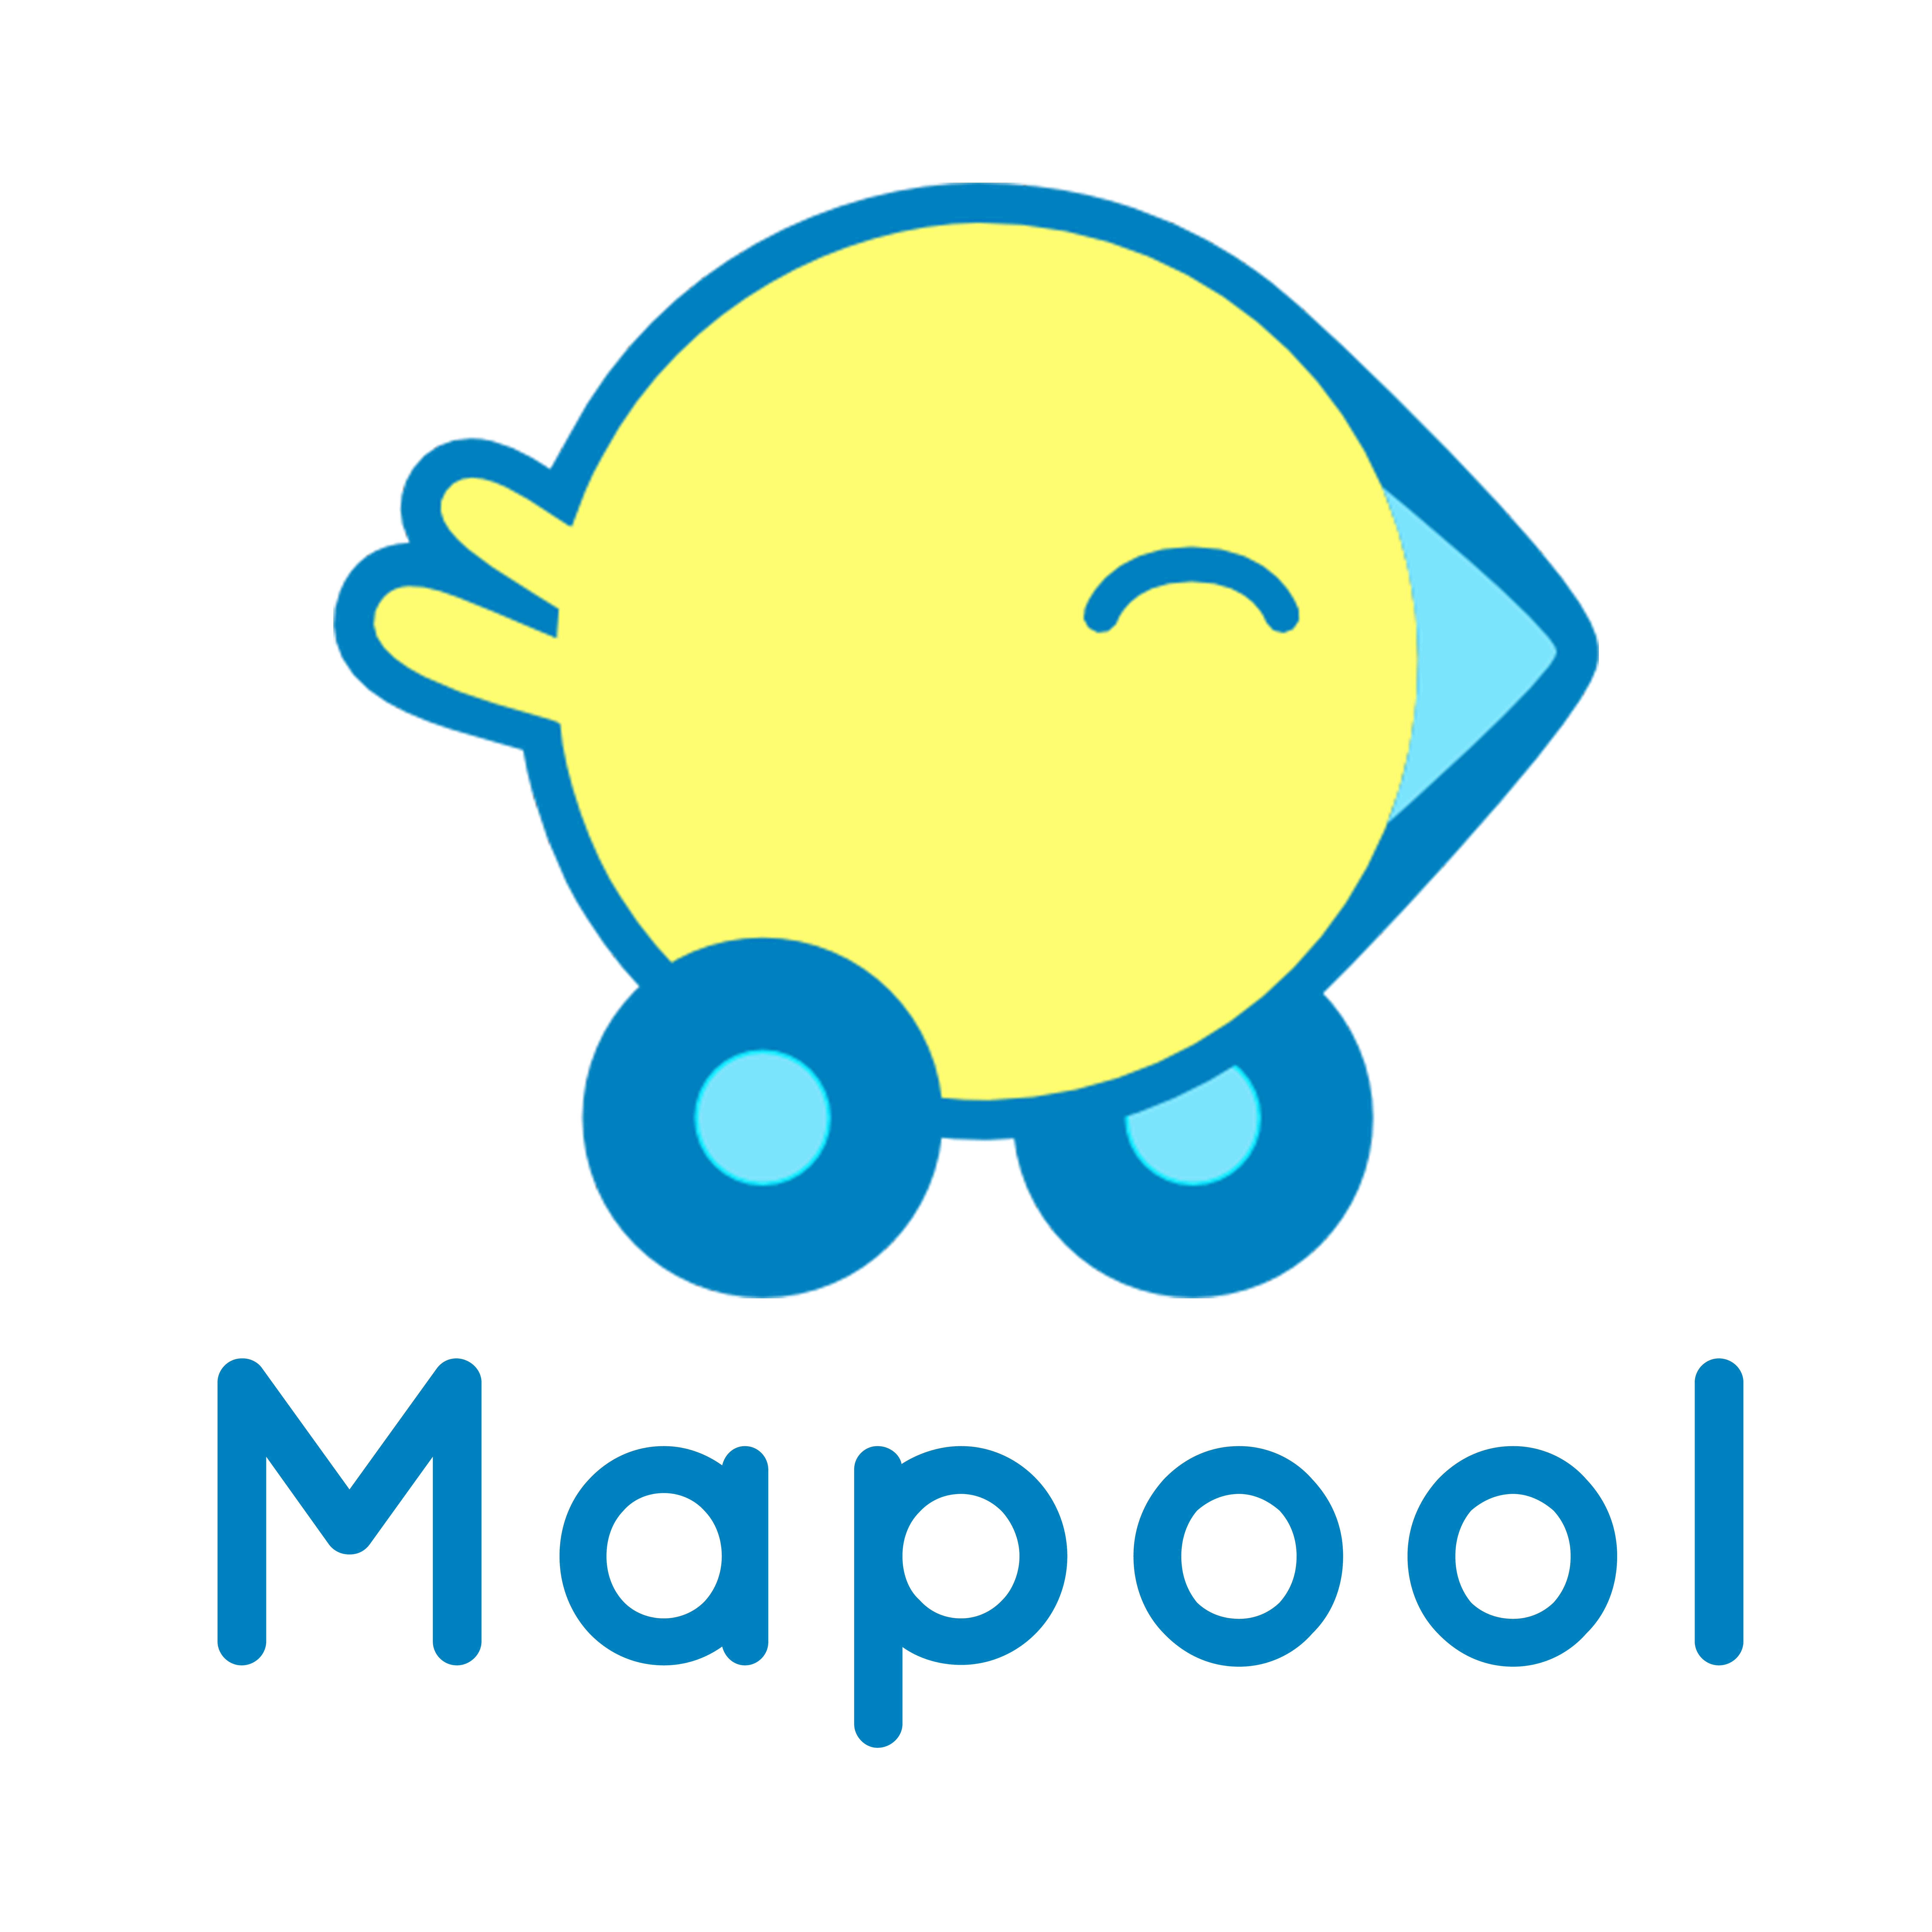 Mapool